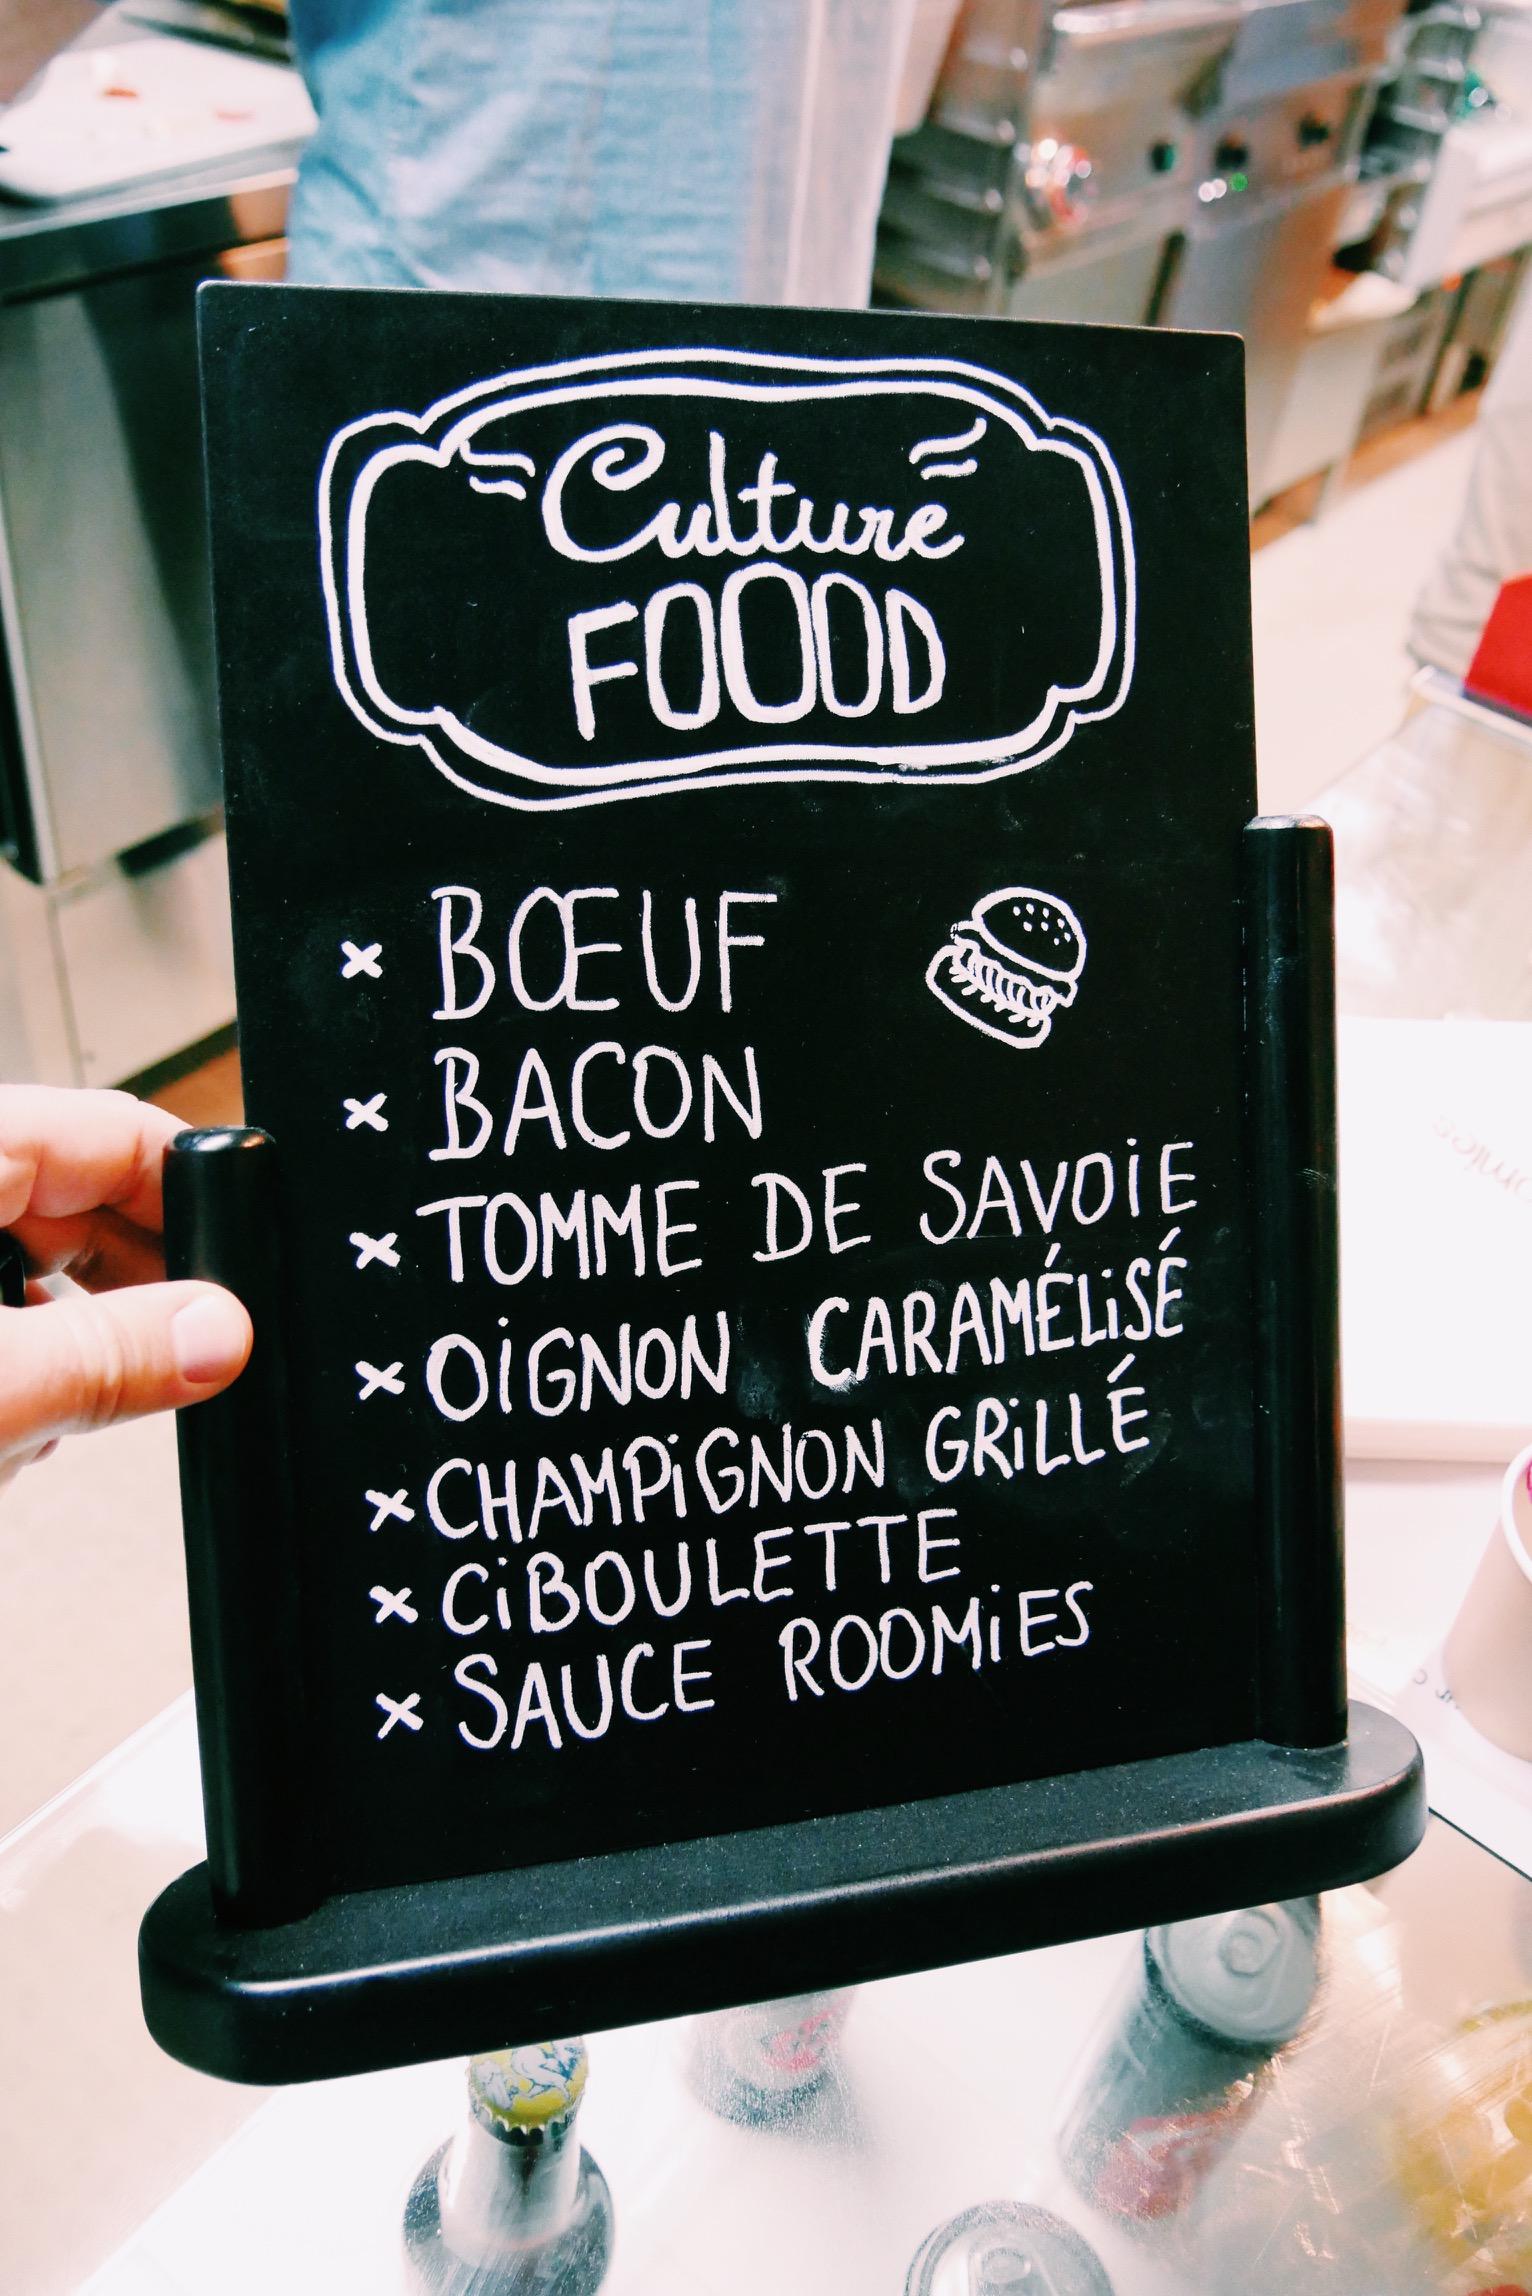 Roomies-carte-composer-son-burger-restaurant-avenue-Percier-paris-photo-usofparis-blog